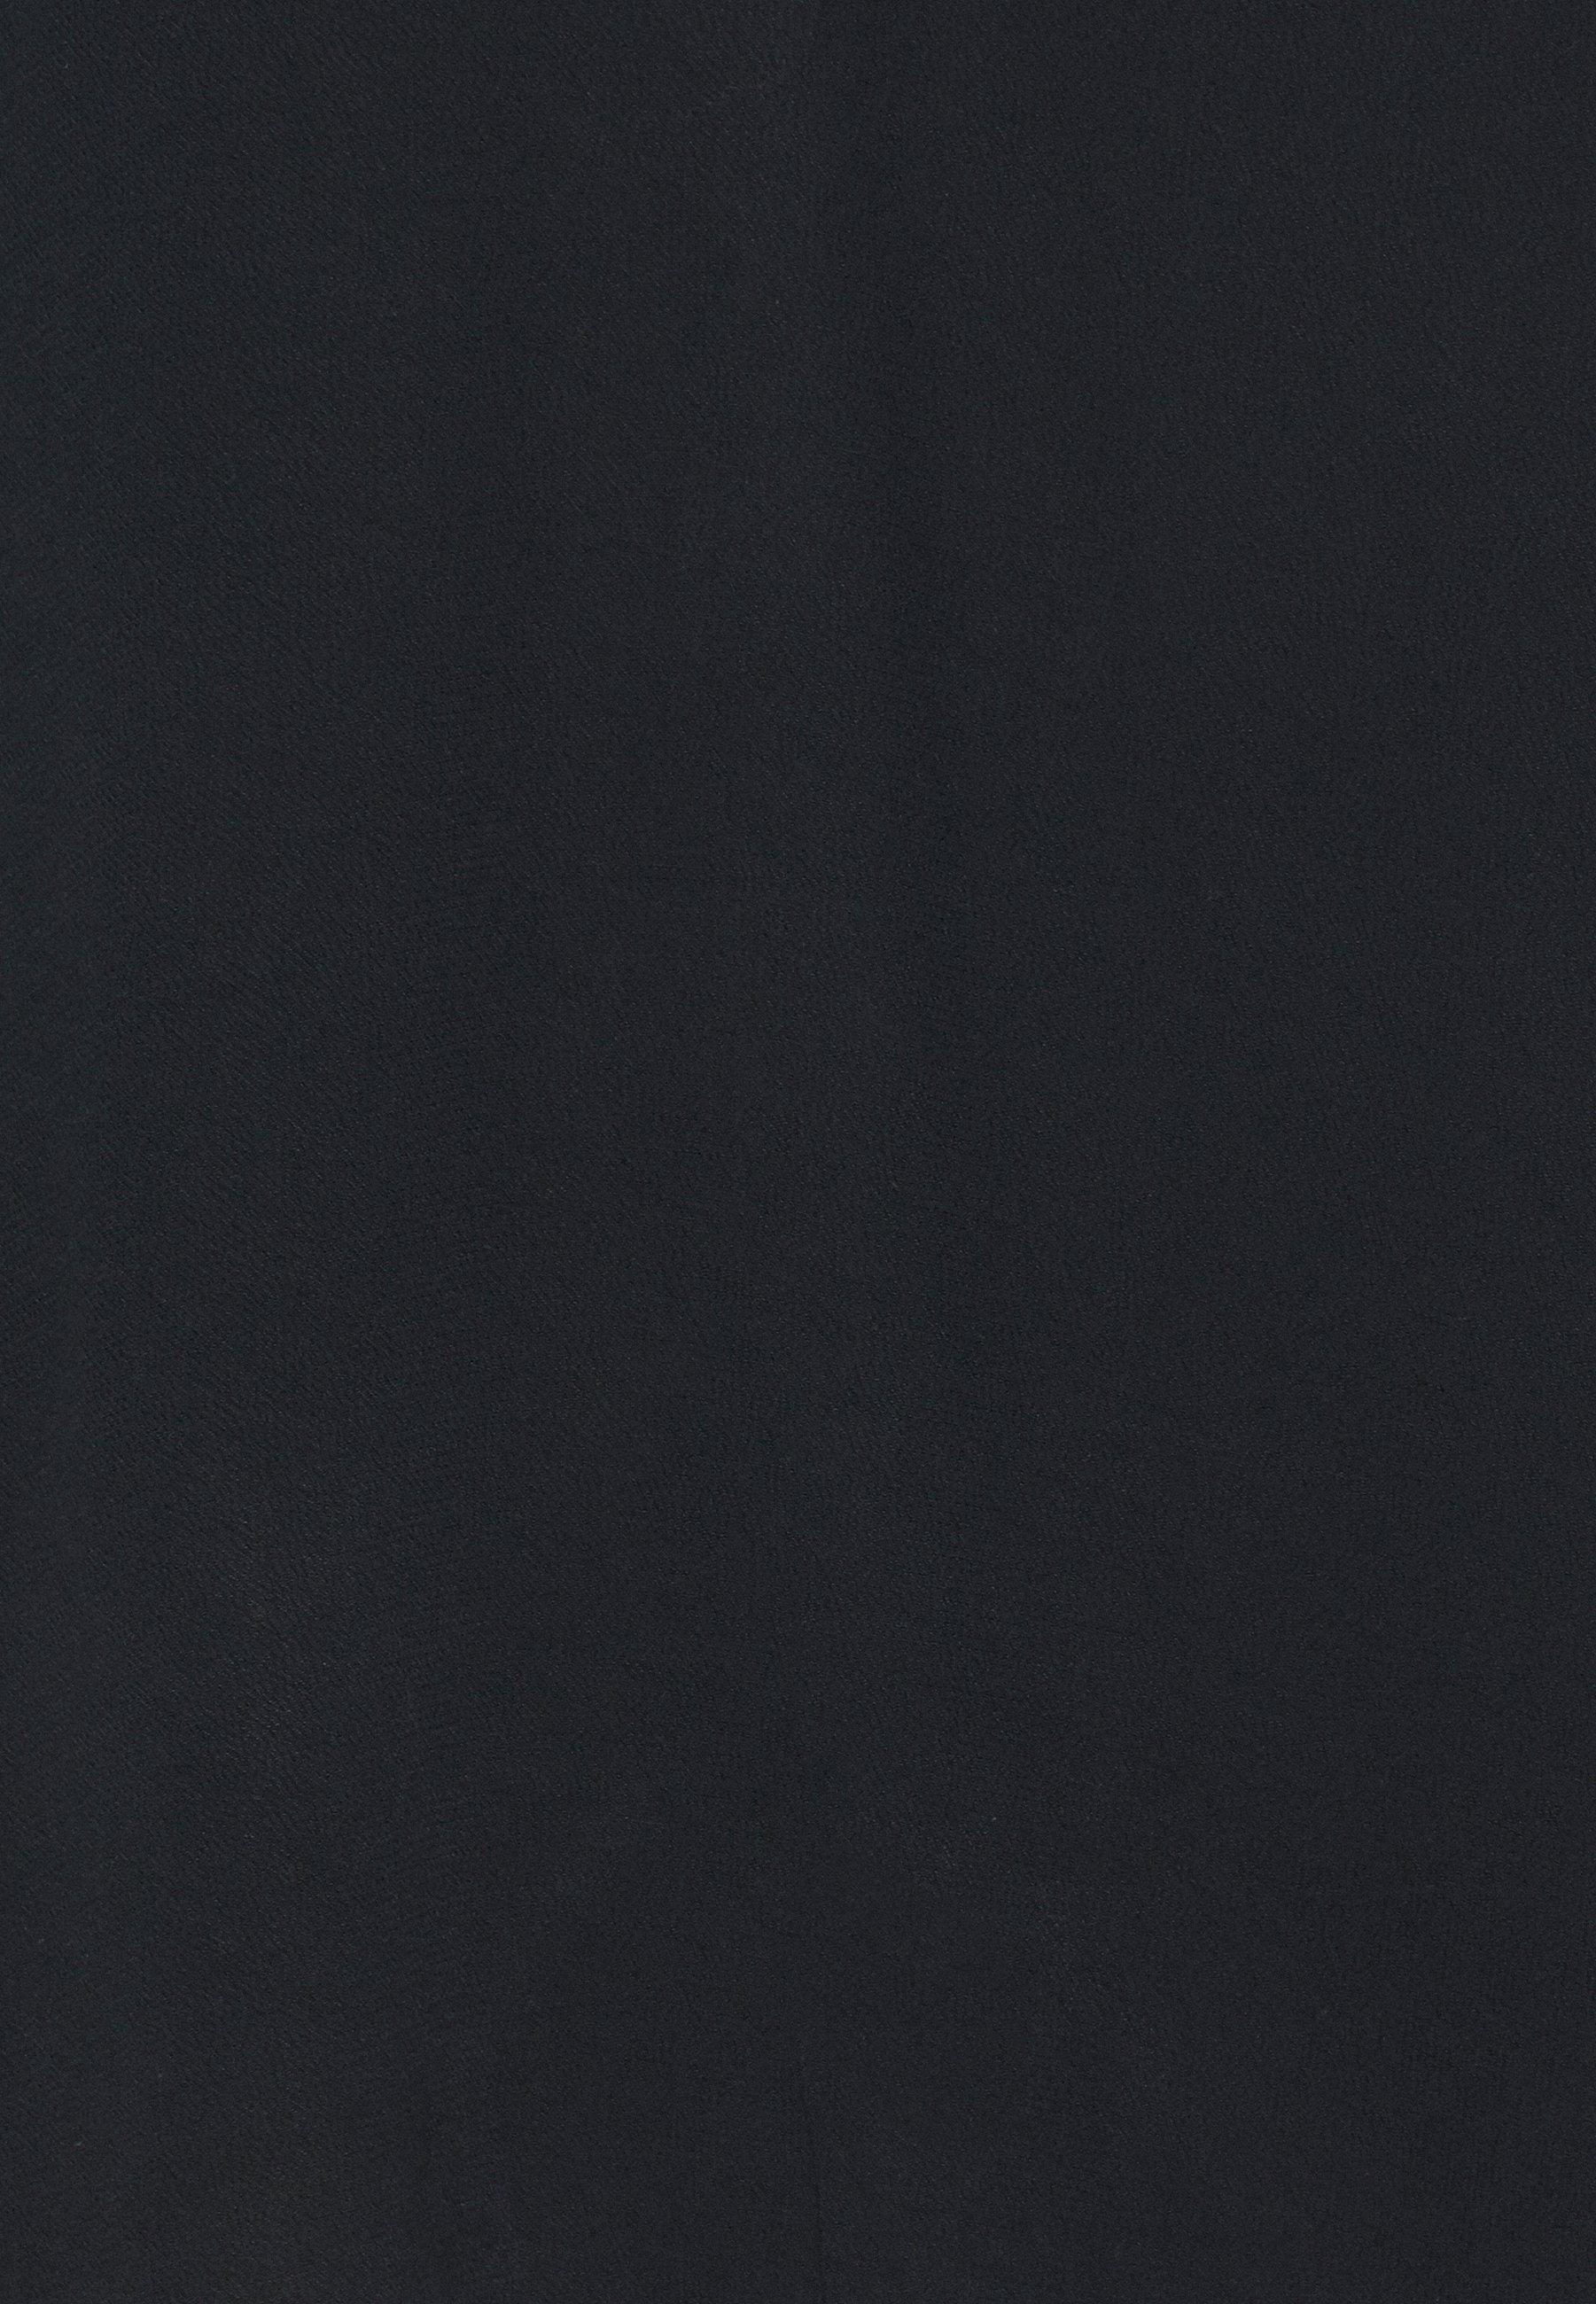 Esprit BLOUSE - Blouse - black - Dameskleding Origineel